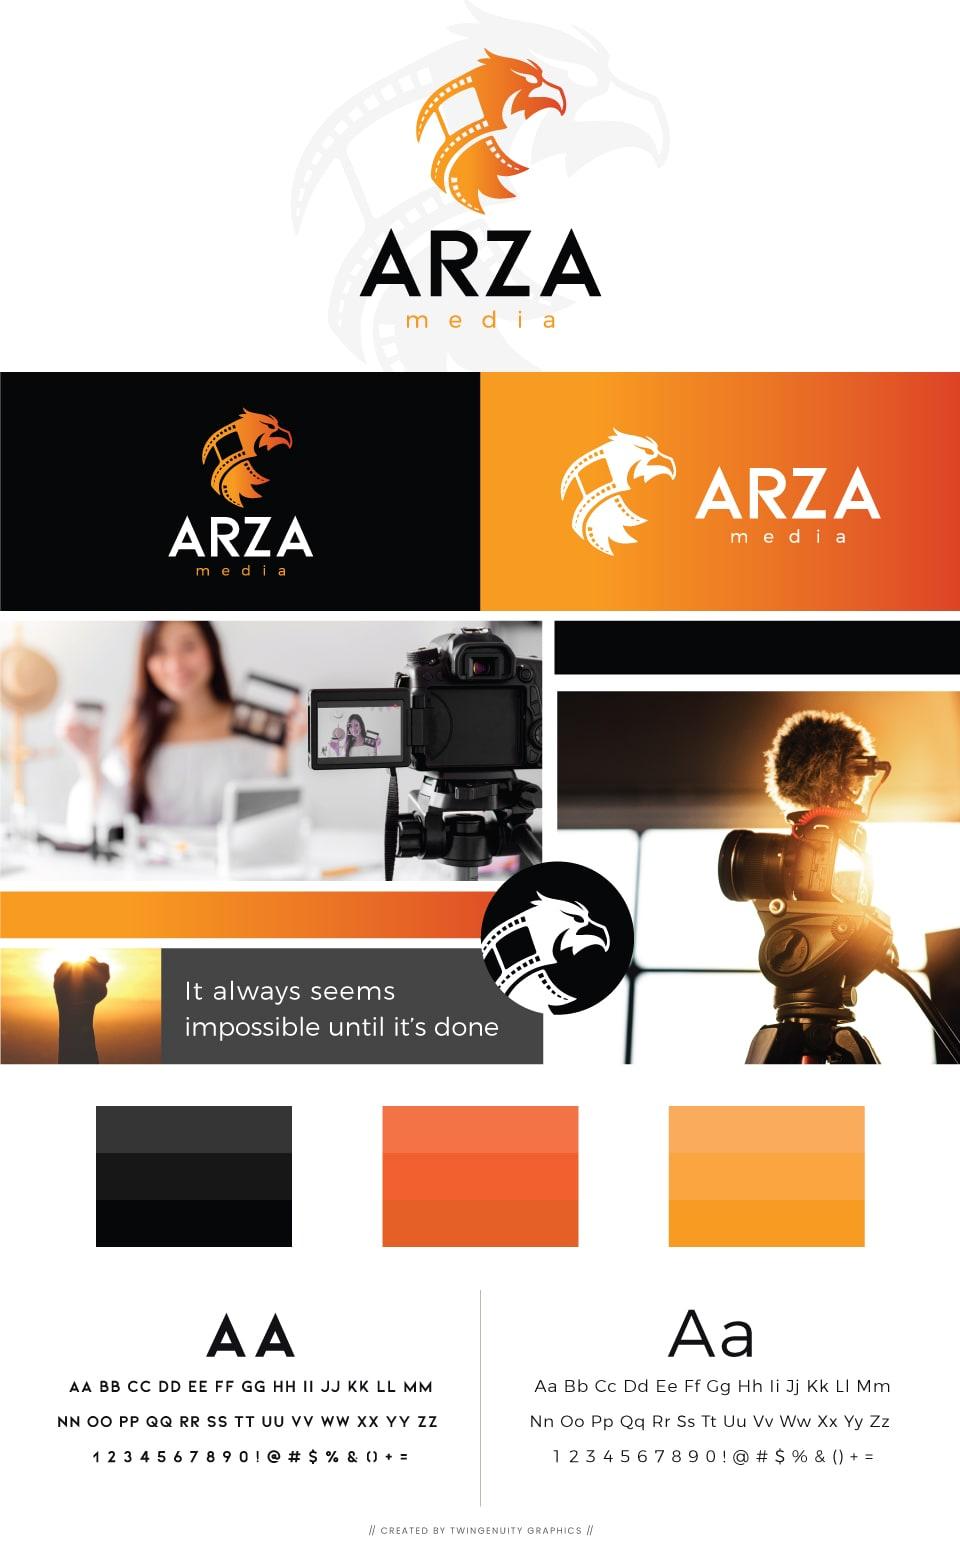 arza media branding board